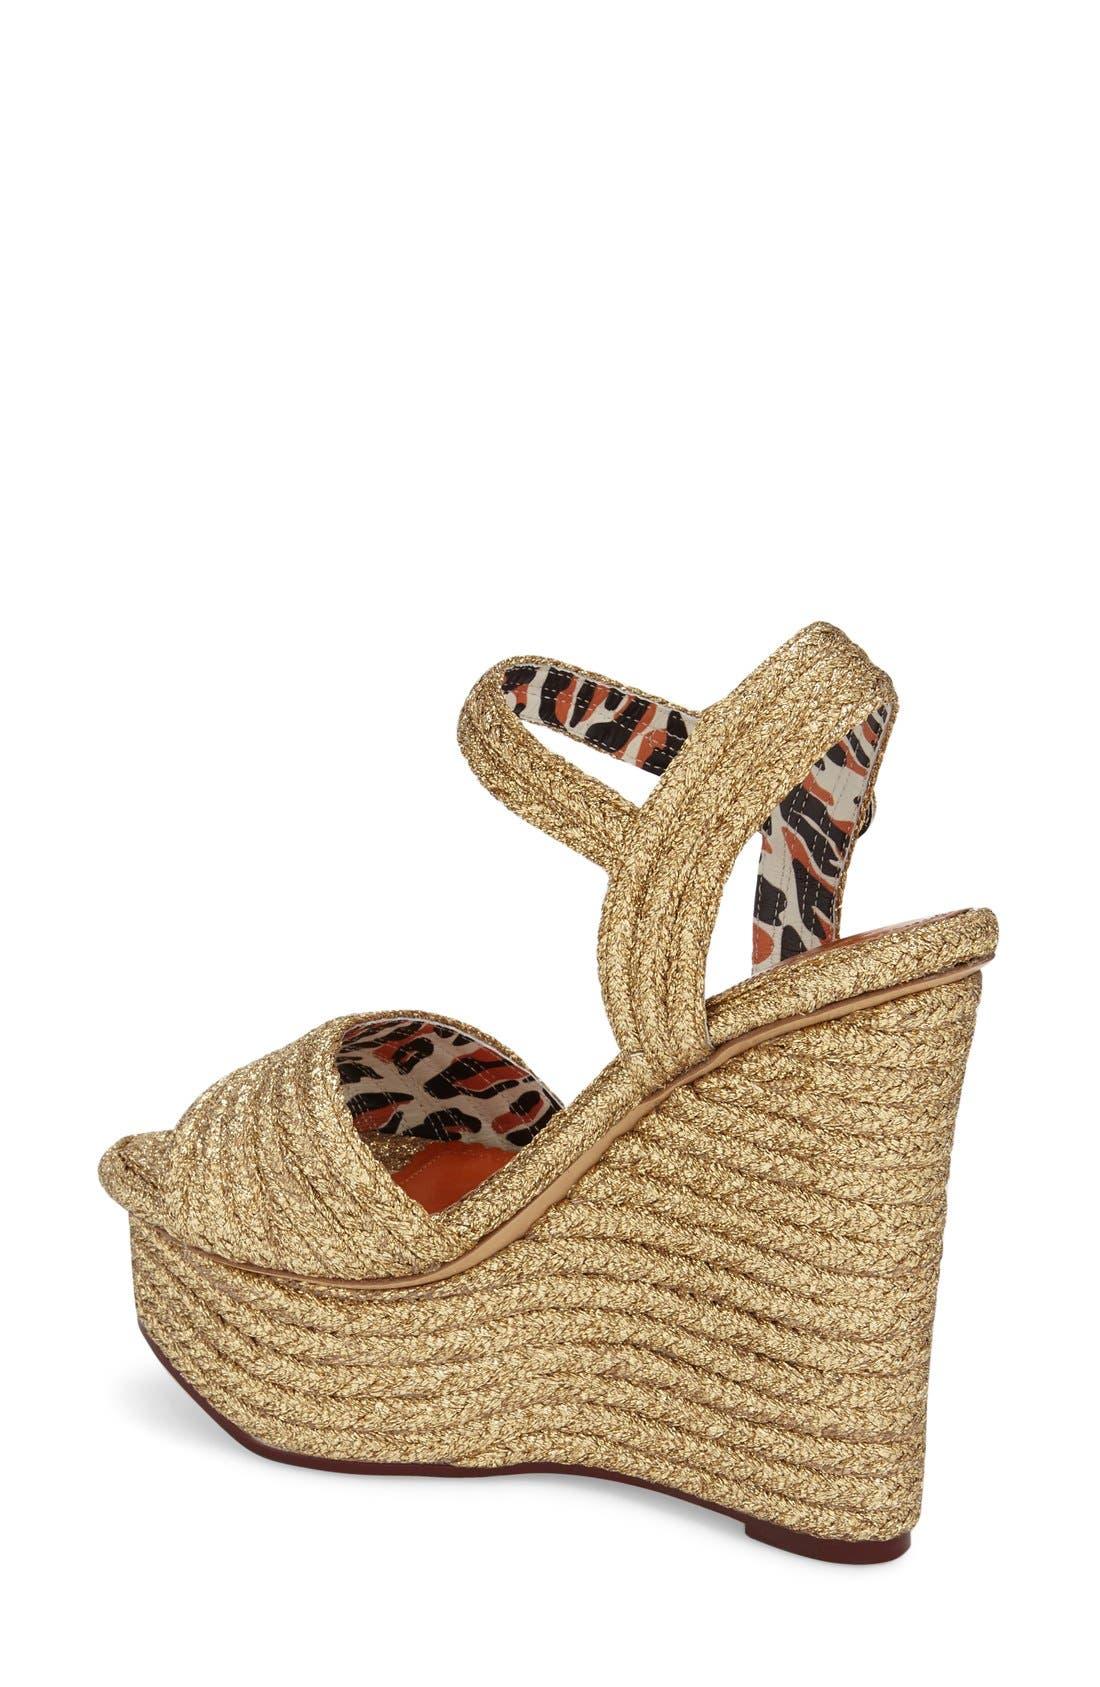 'Karen' Platform Wedge Sandal,                             Alternate thumbnail 2, color,                             711